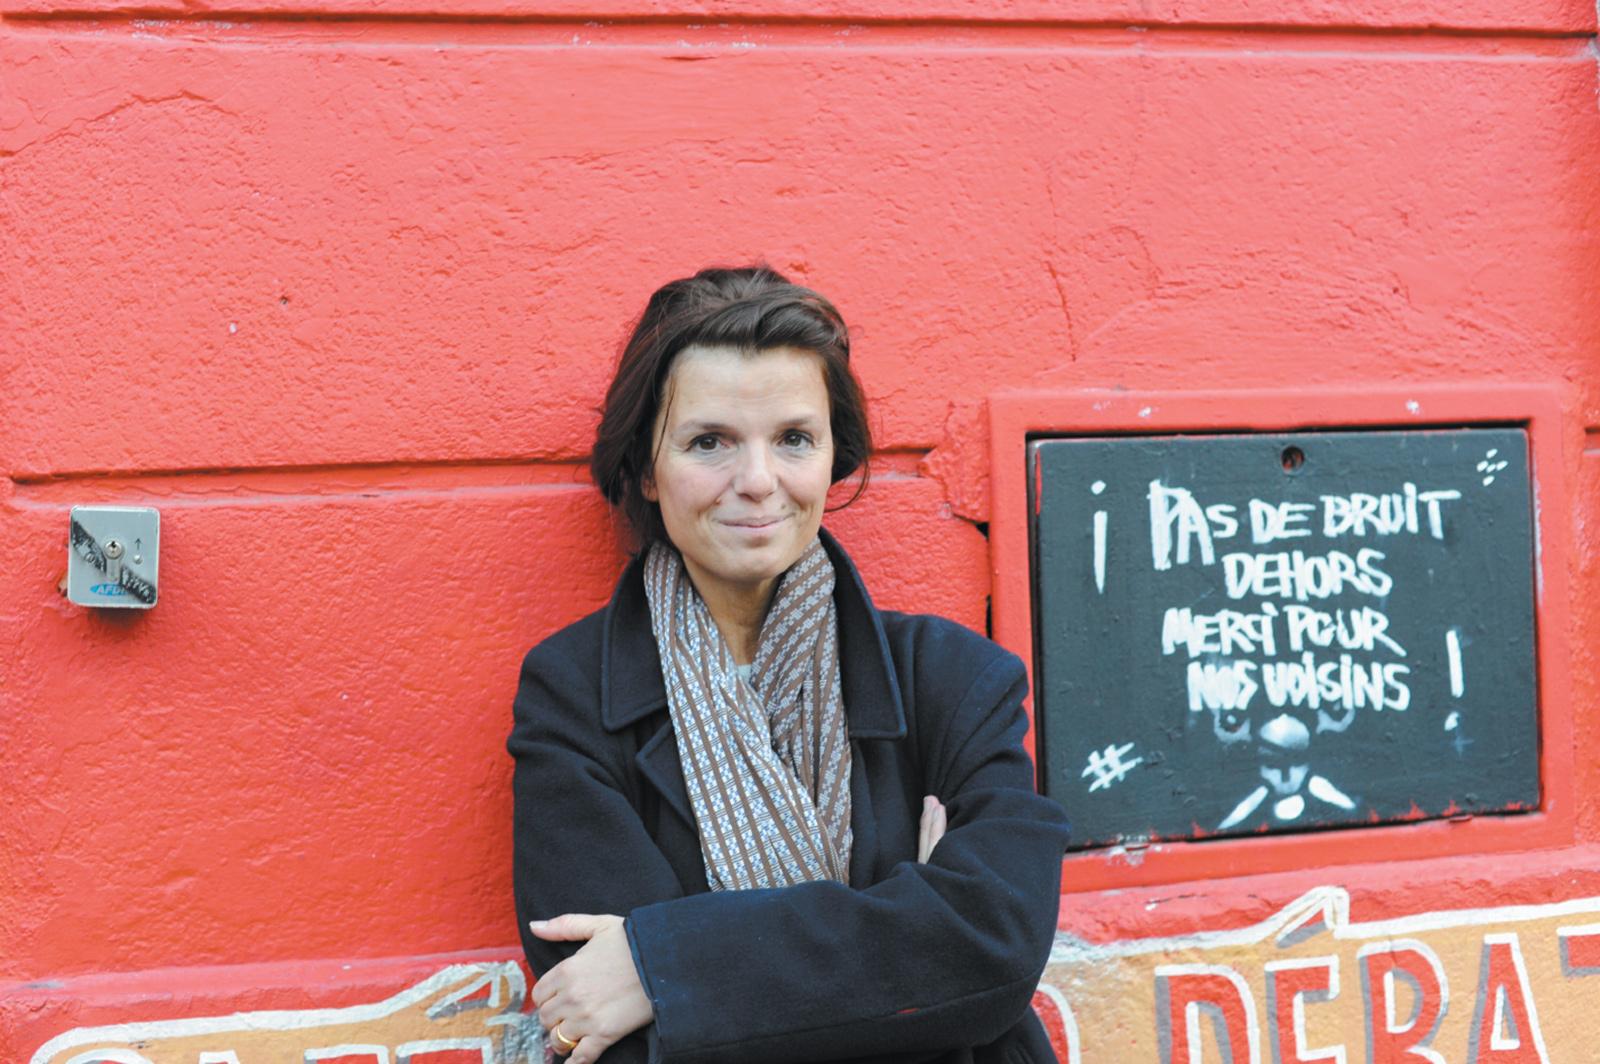 Maylis de Kerangal, Marseille, October 2010